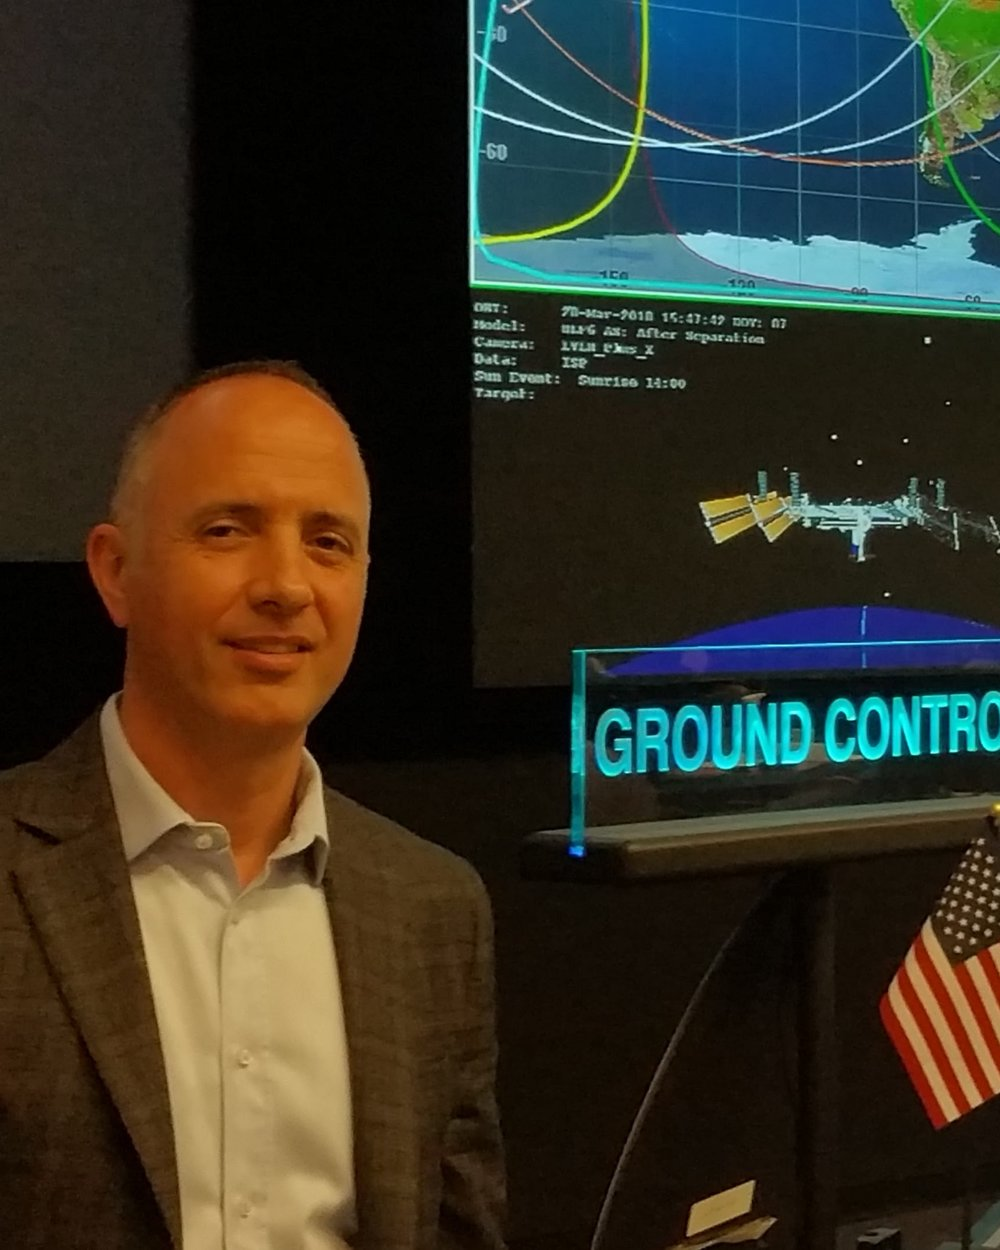 Amir Blachman  Chief Business Officer, Axiom Space Advisory Board Member, Bye Aerospace Former Managing Director, Space Angels